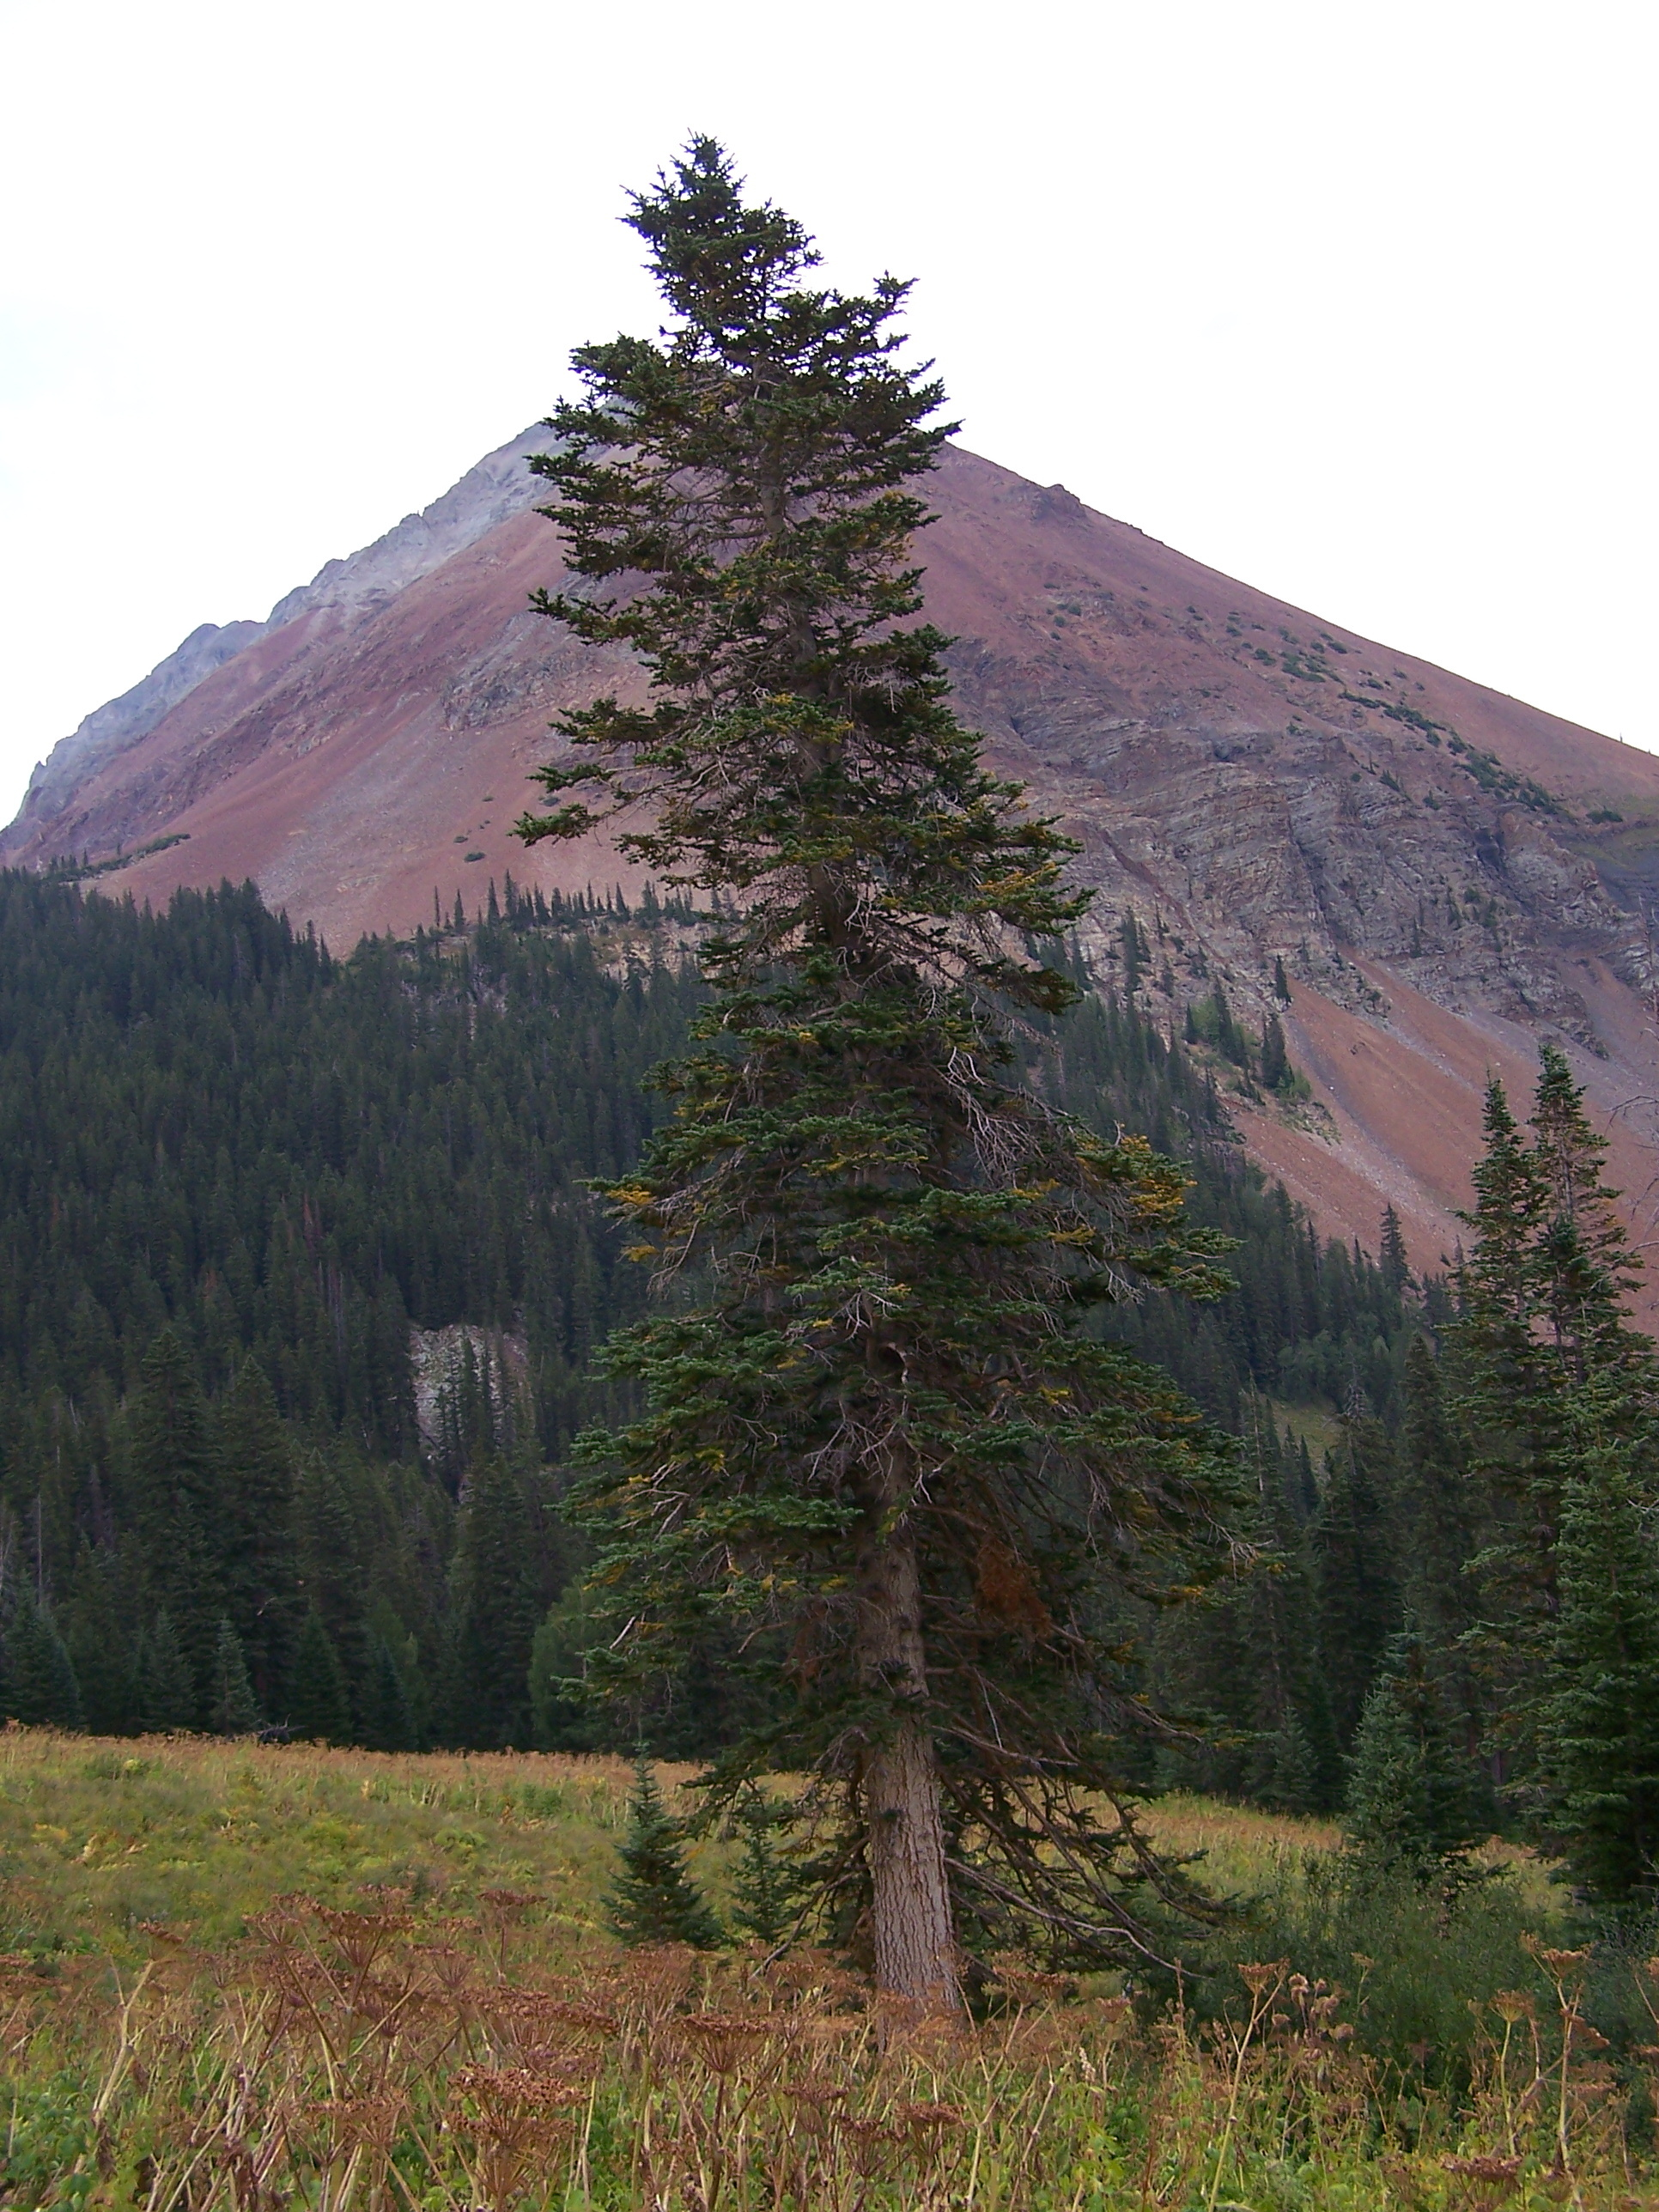 Image of subalpine fir